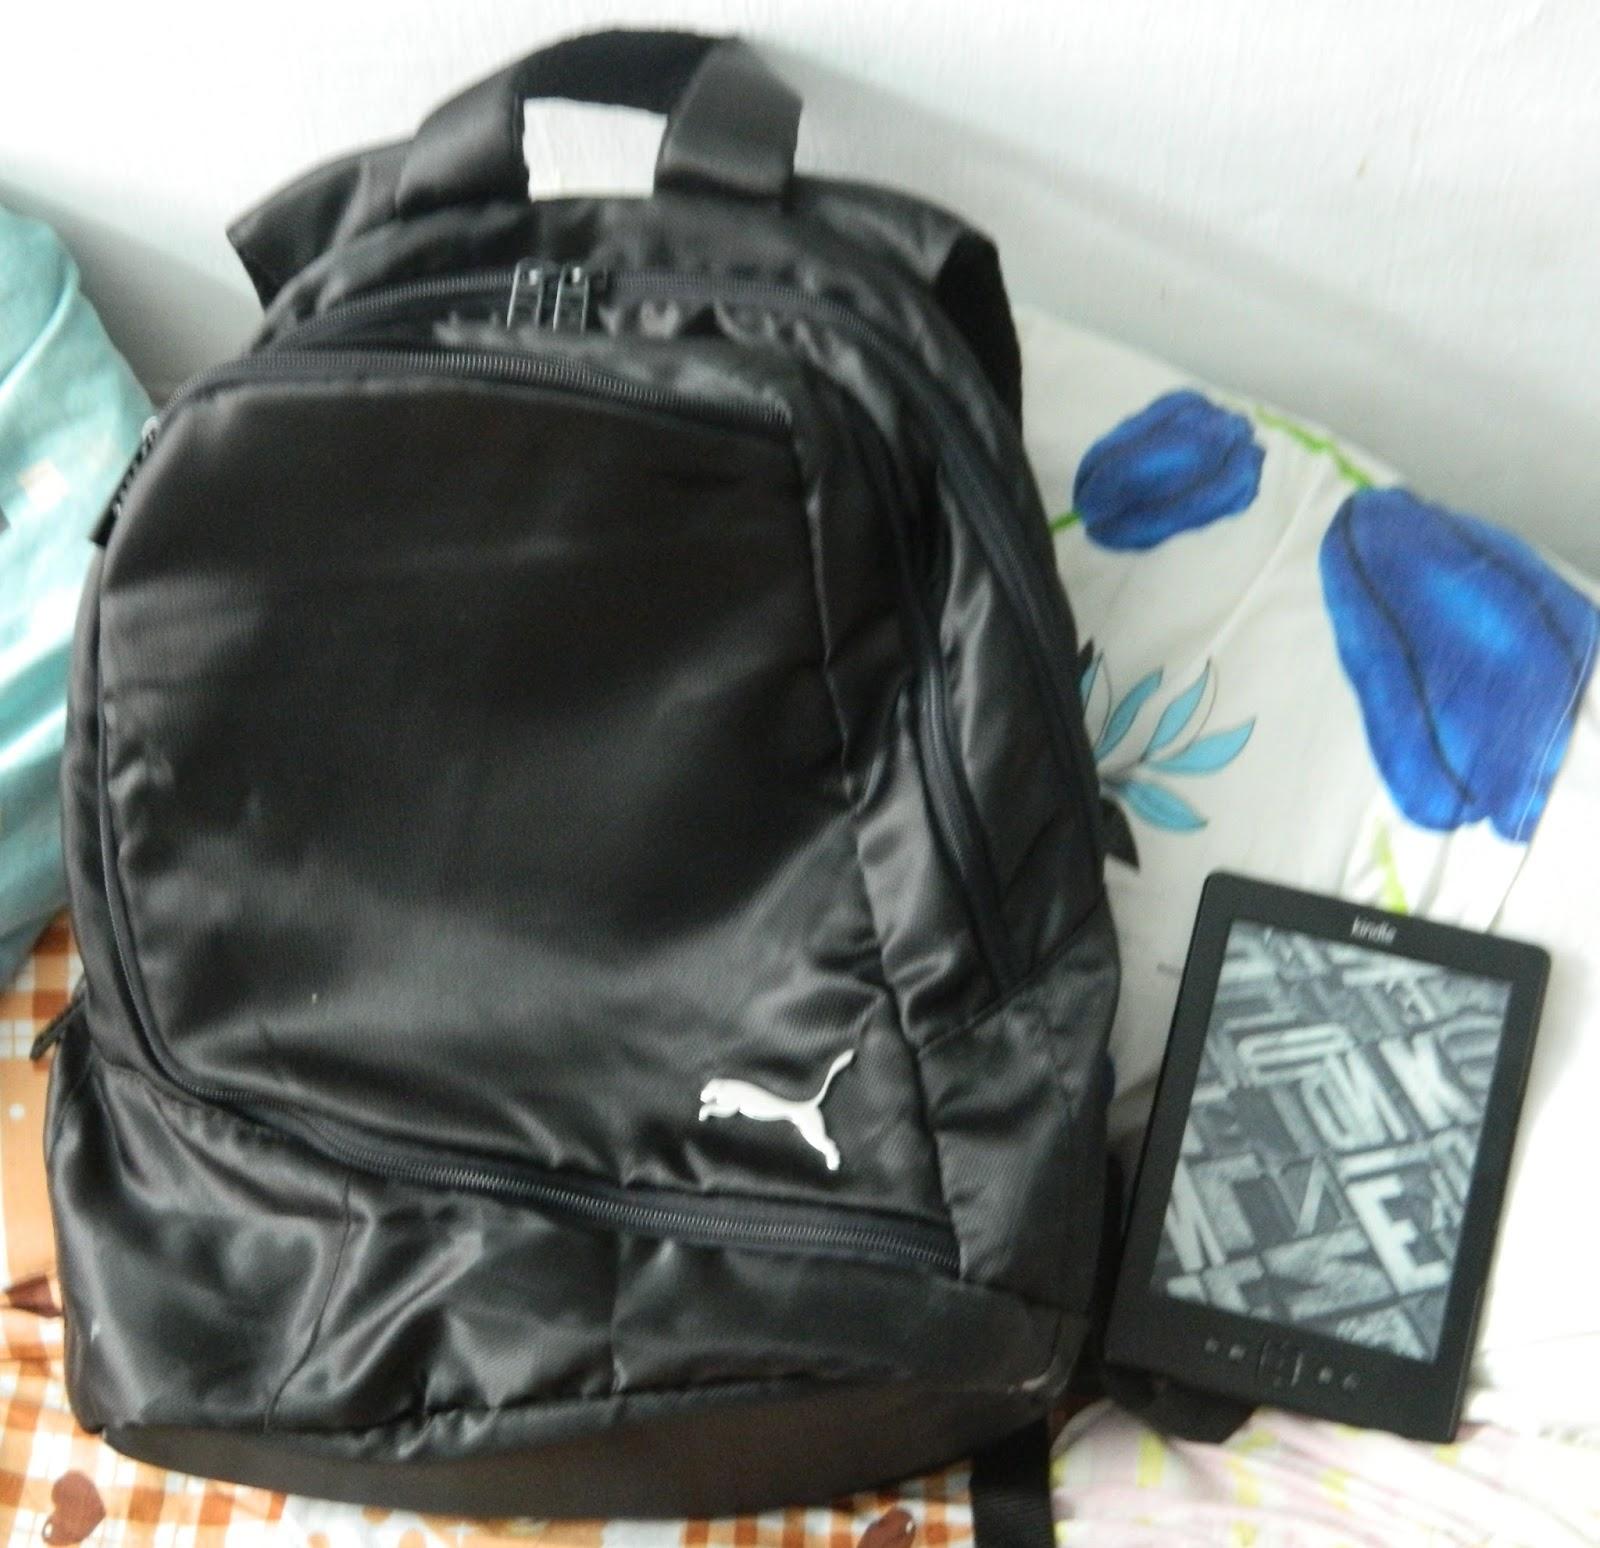 Evil Flipkart - A review of the Puma Elite Large Backpack ... 4e376b8a24151